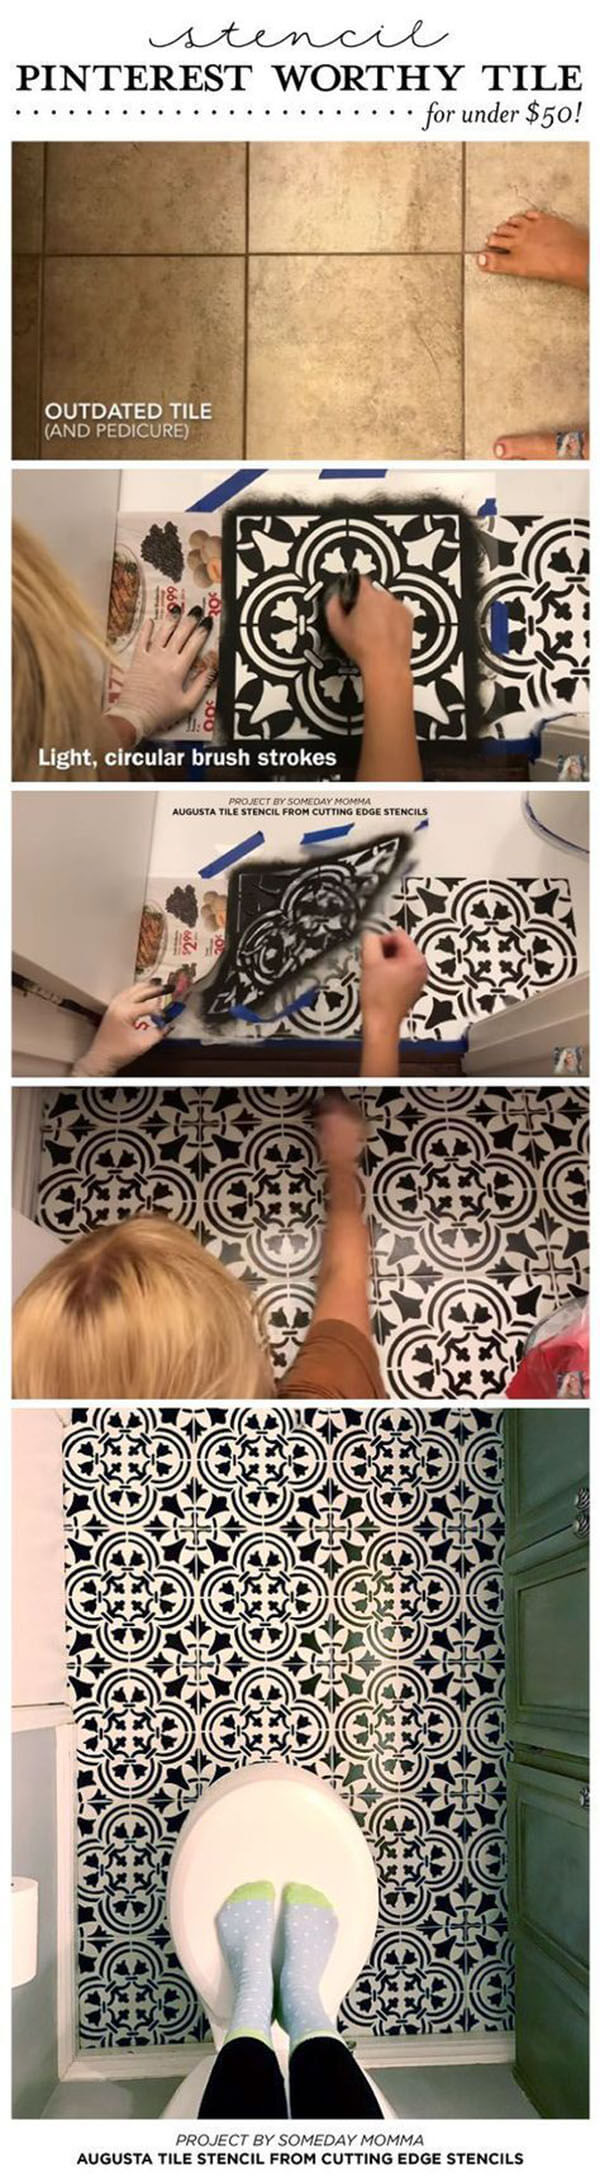 Create Old World Mosaic Floor with Stencils